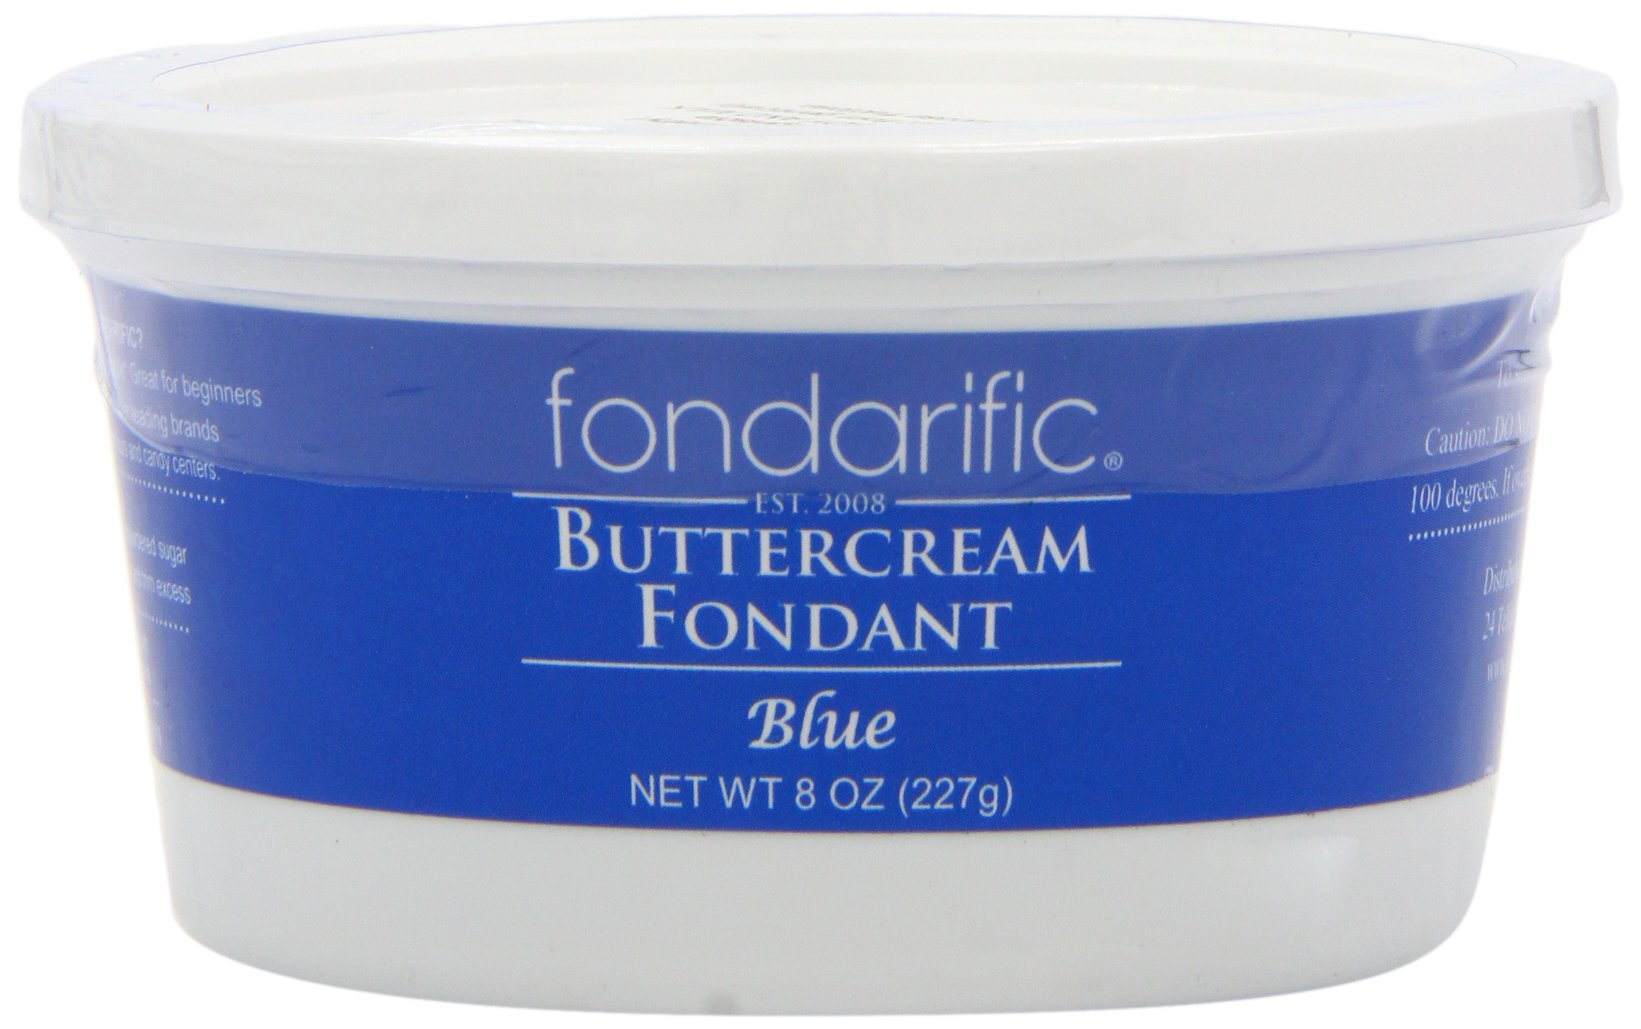 Fondarific Buttercream Fondant, Blue, 8 Ounce